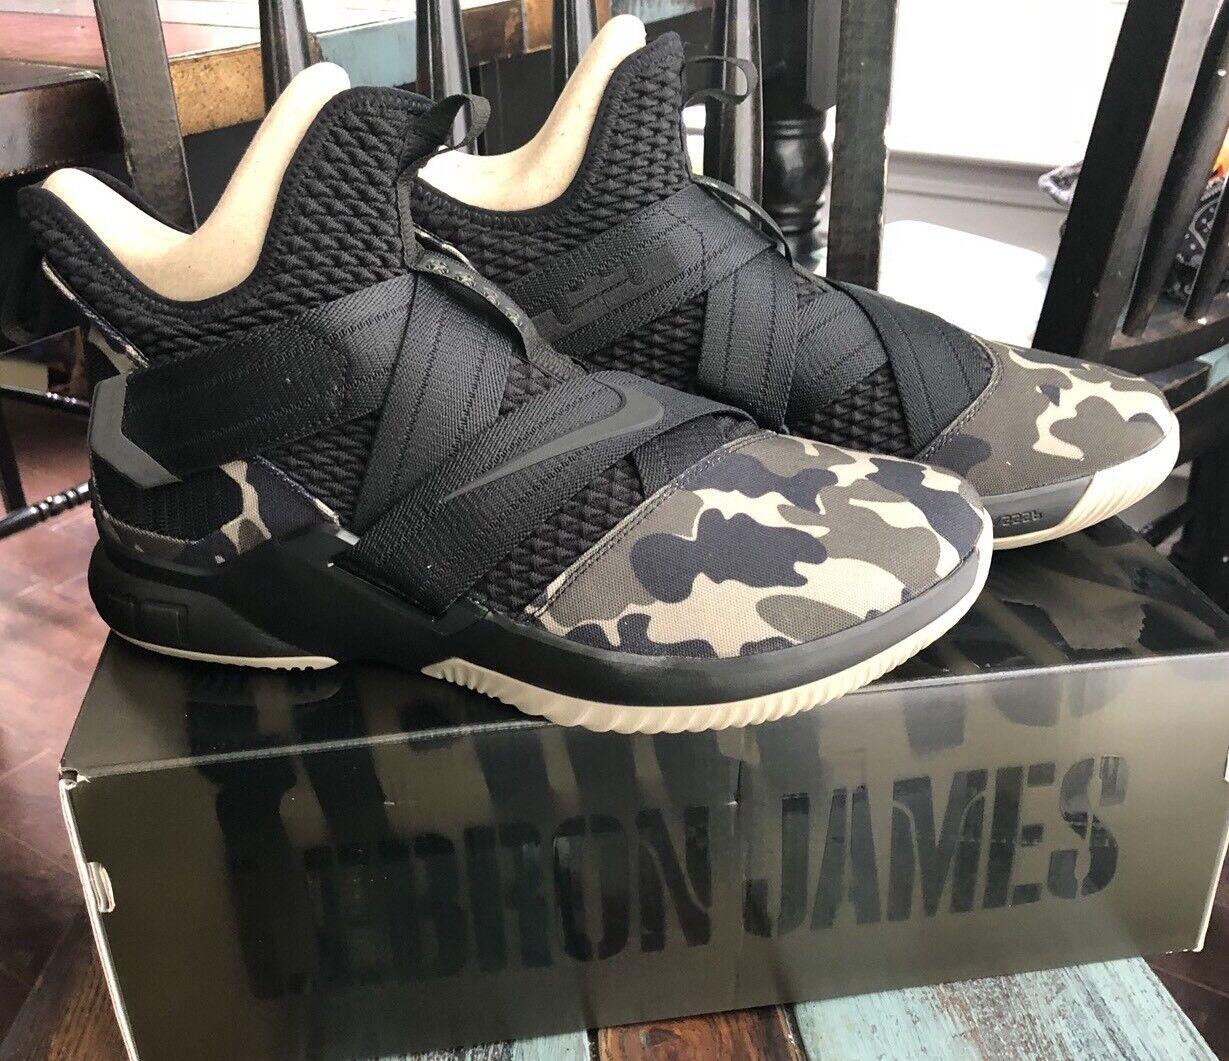 Nike Lebron Soldier 12 SFG Camo Mens AO4054-001 Black Hazel Rush shoes Size 12